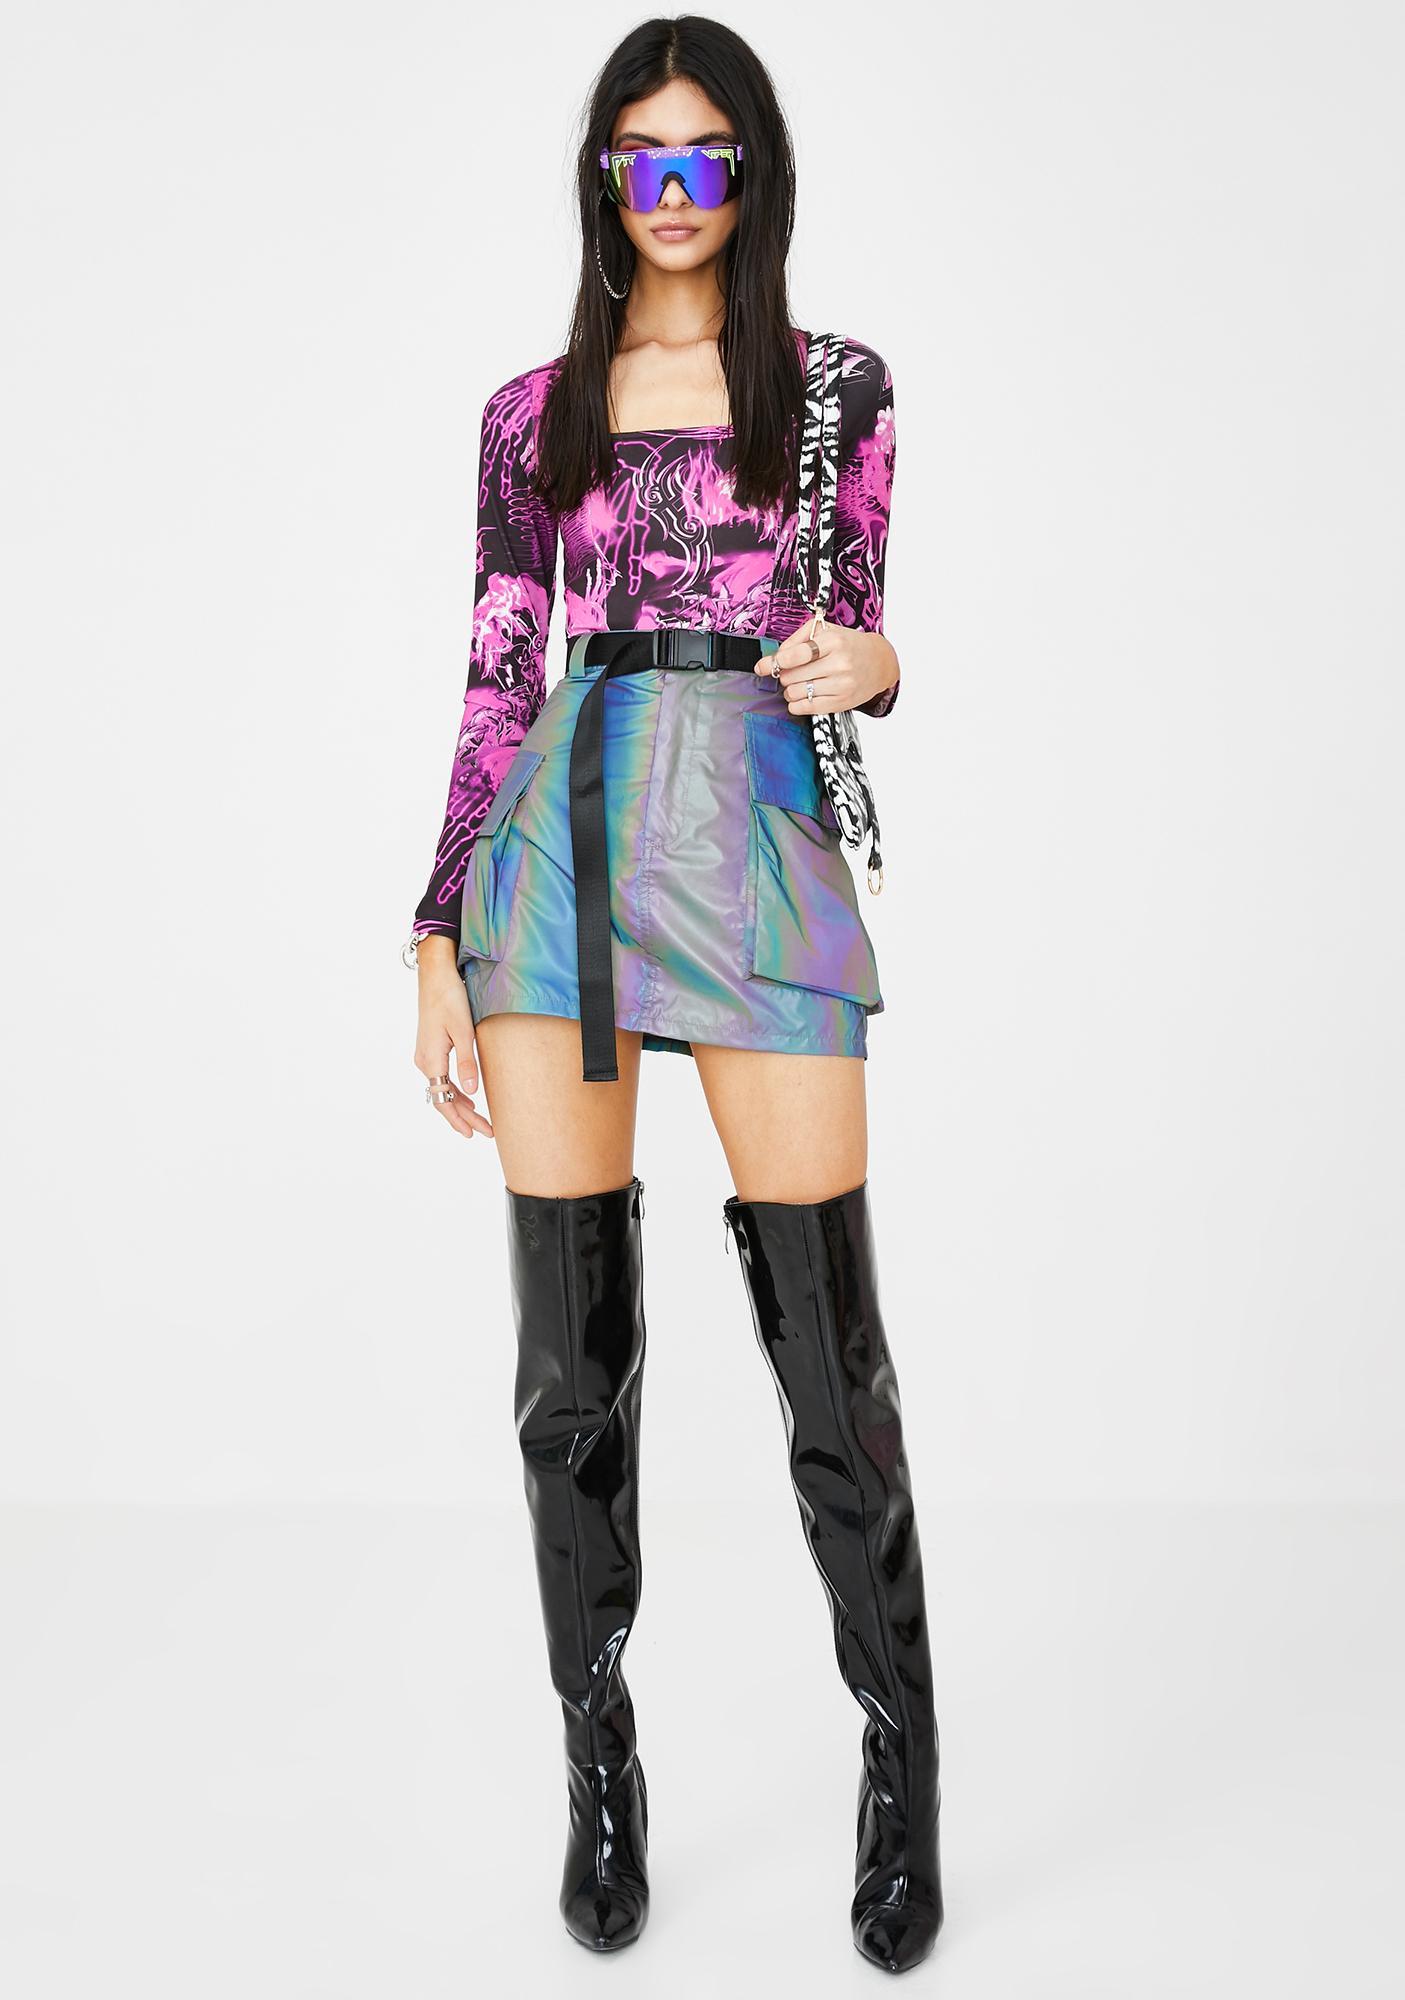 Jaded London Pink Skull Print Long Sleeve Bodysuit